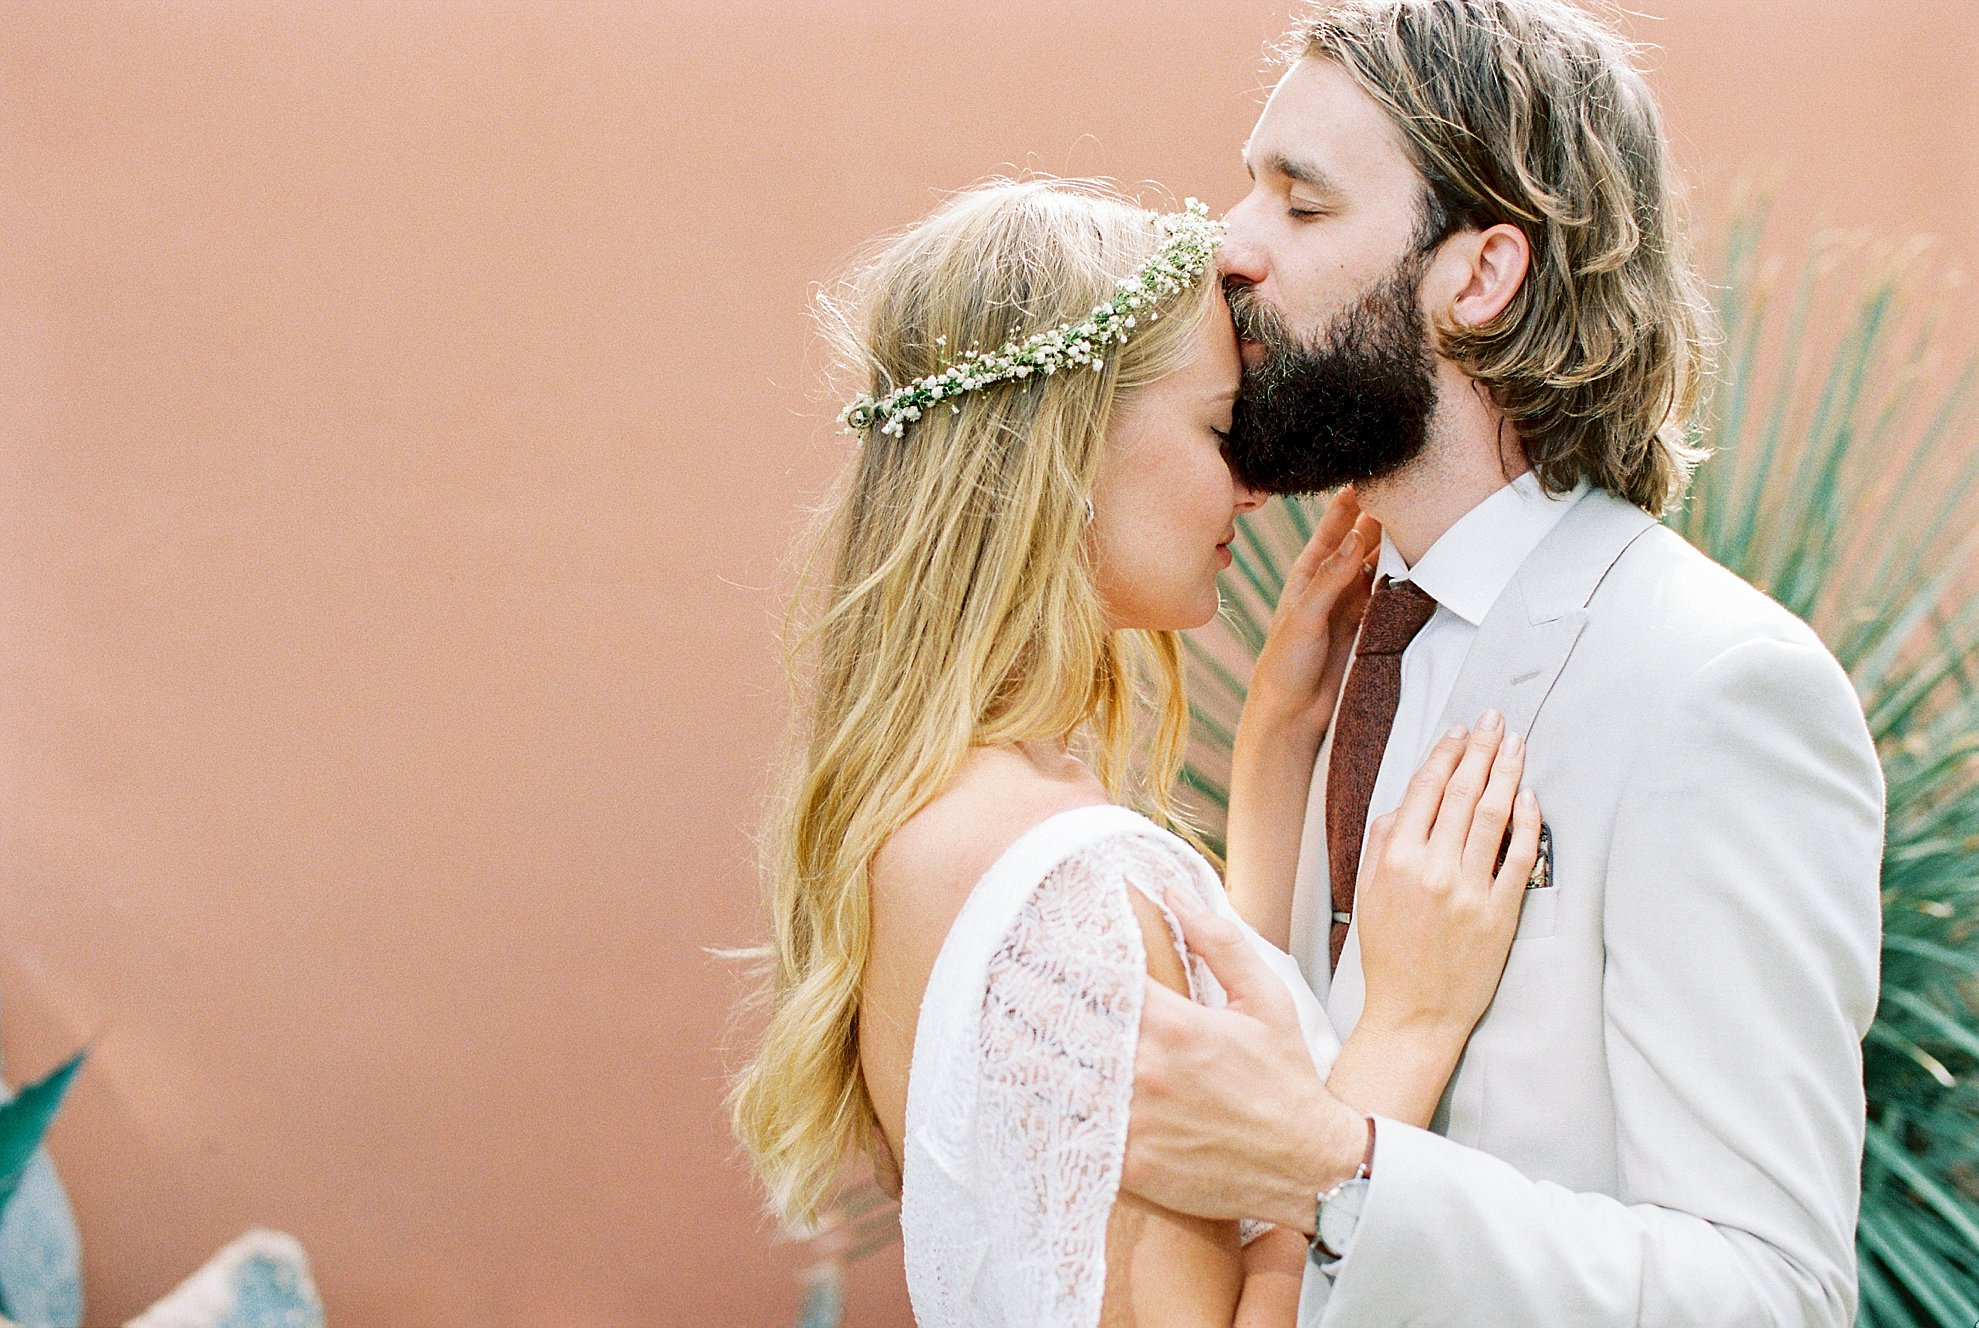 Amanda-Drost-photography-Hortus-Amsterdam-wedding_0018.jpg